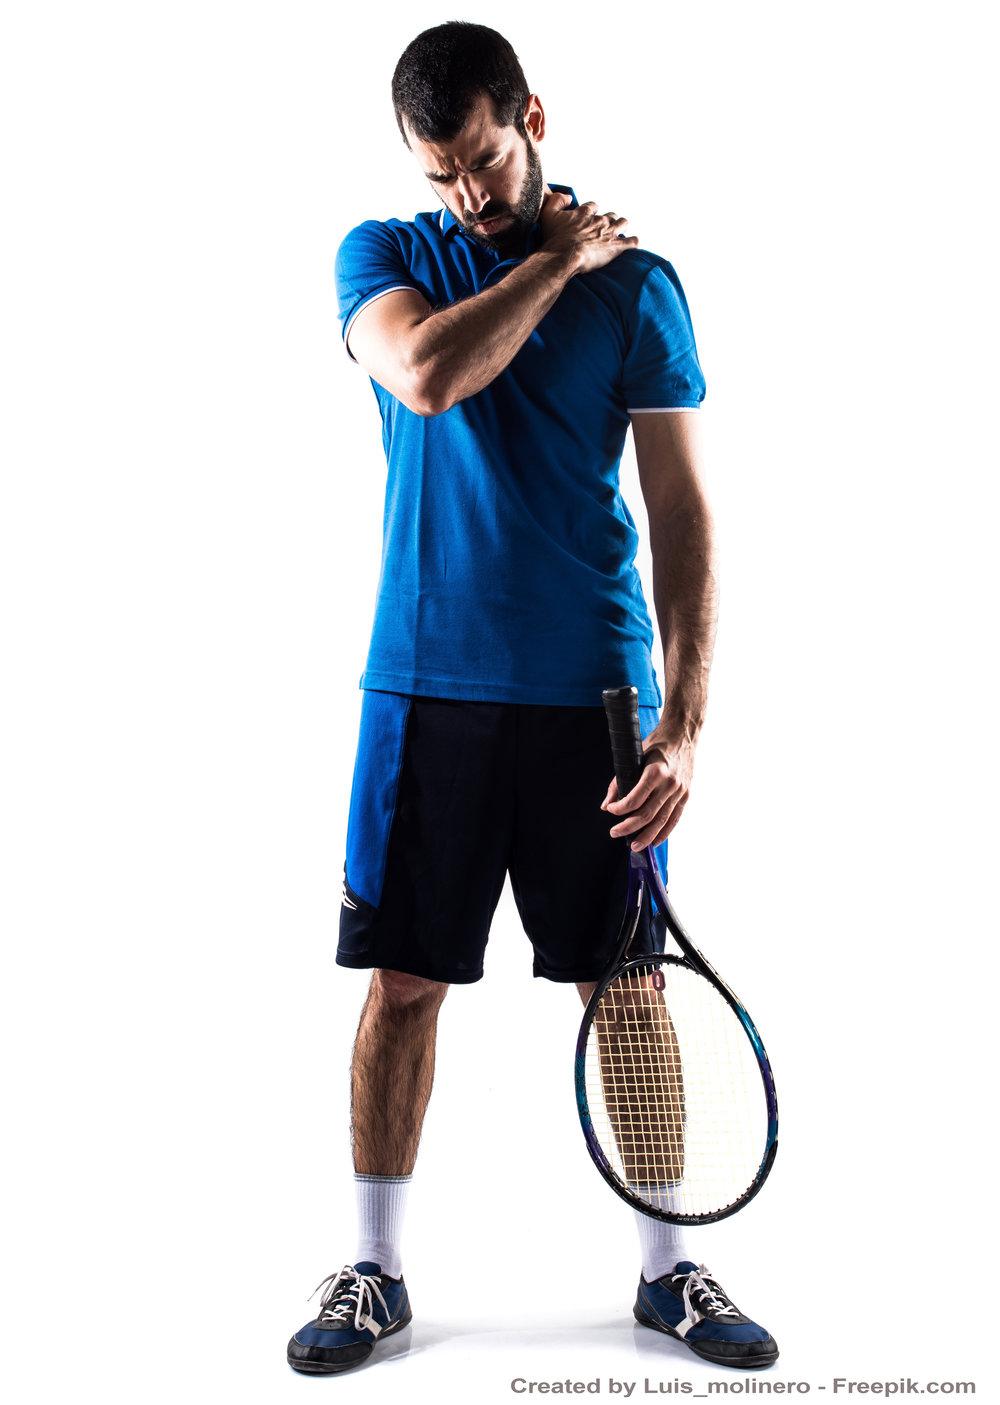 tennis-neck-pain-sports-injuries-injury-medical-mart-mississauga-james-singh-heartland-sports.jpg